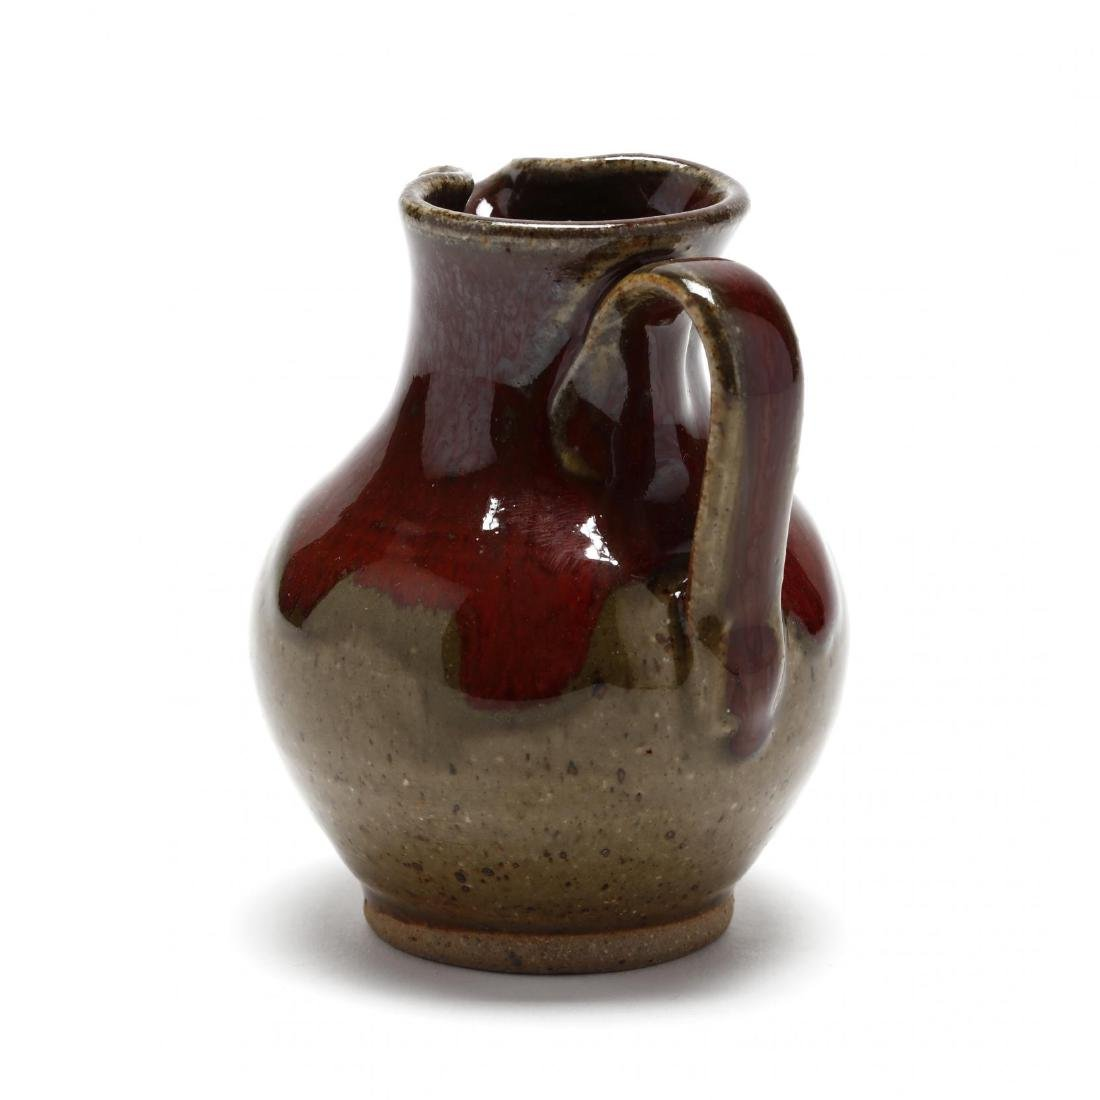 An Assortment of Jugtown Pottery - 2